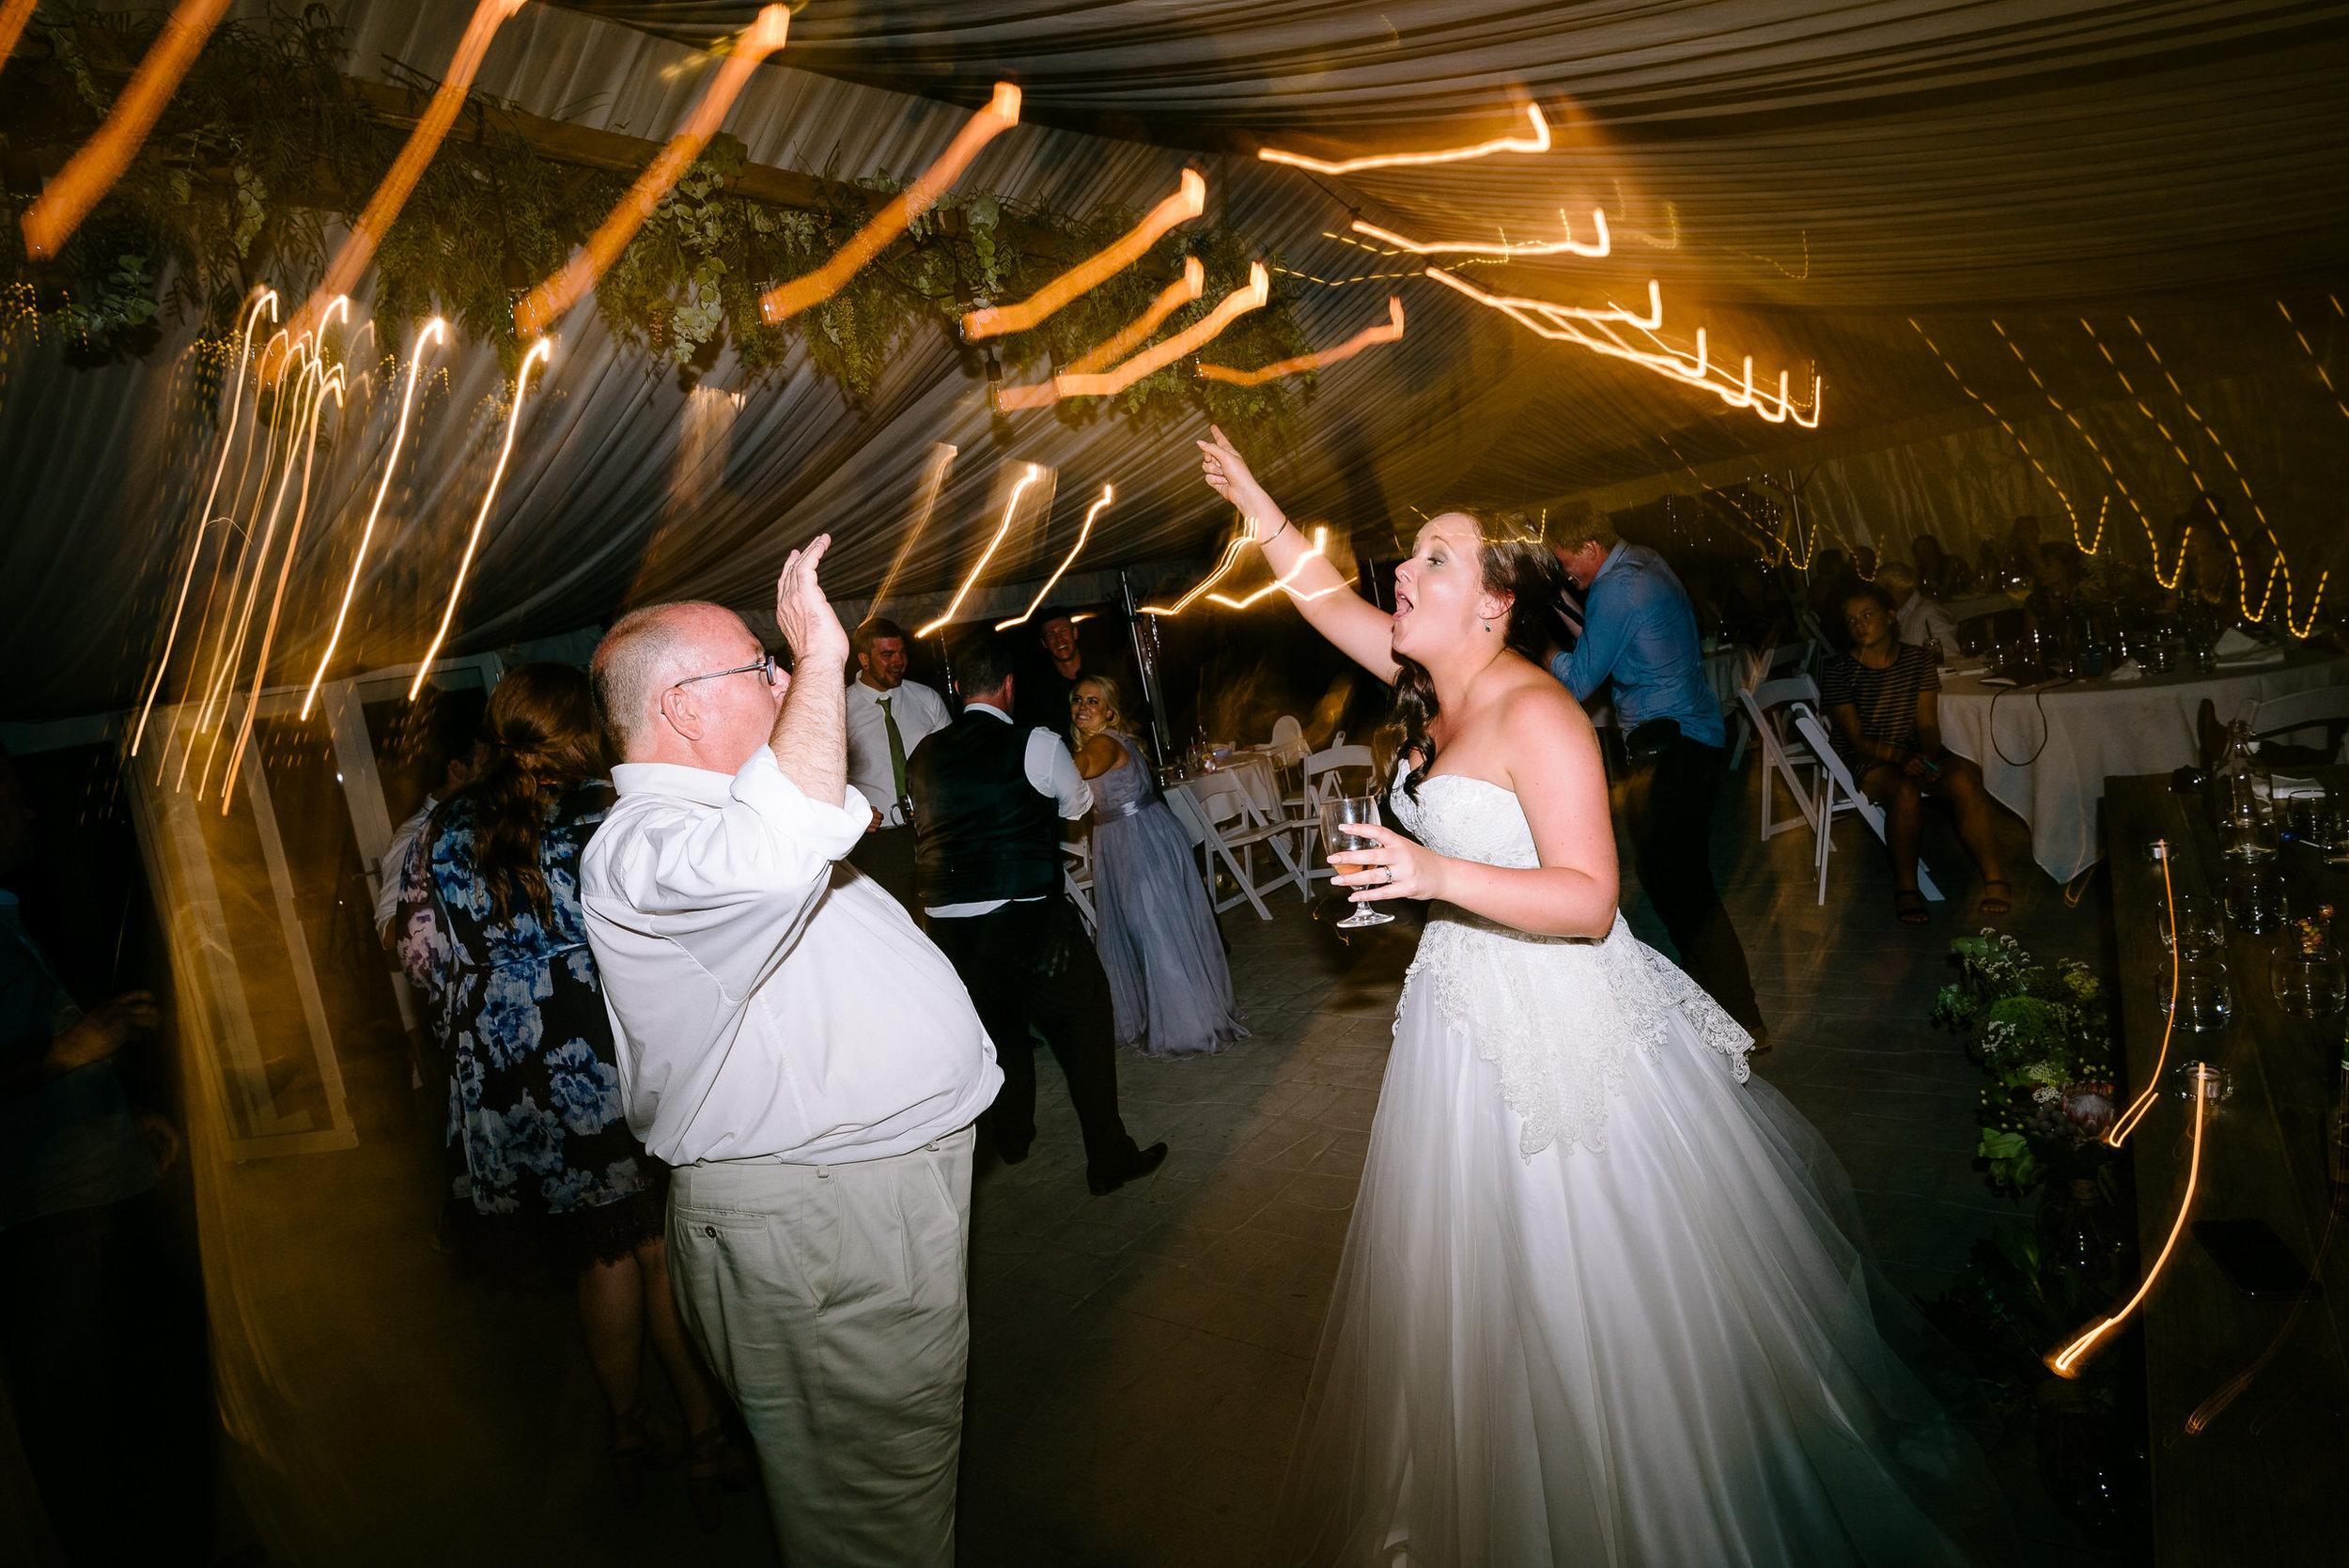 Justin_Jim_Echuca_Wedding_Photography_Tindarra-339.JPG